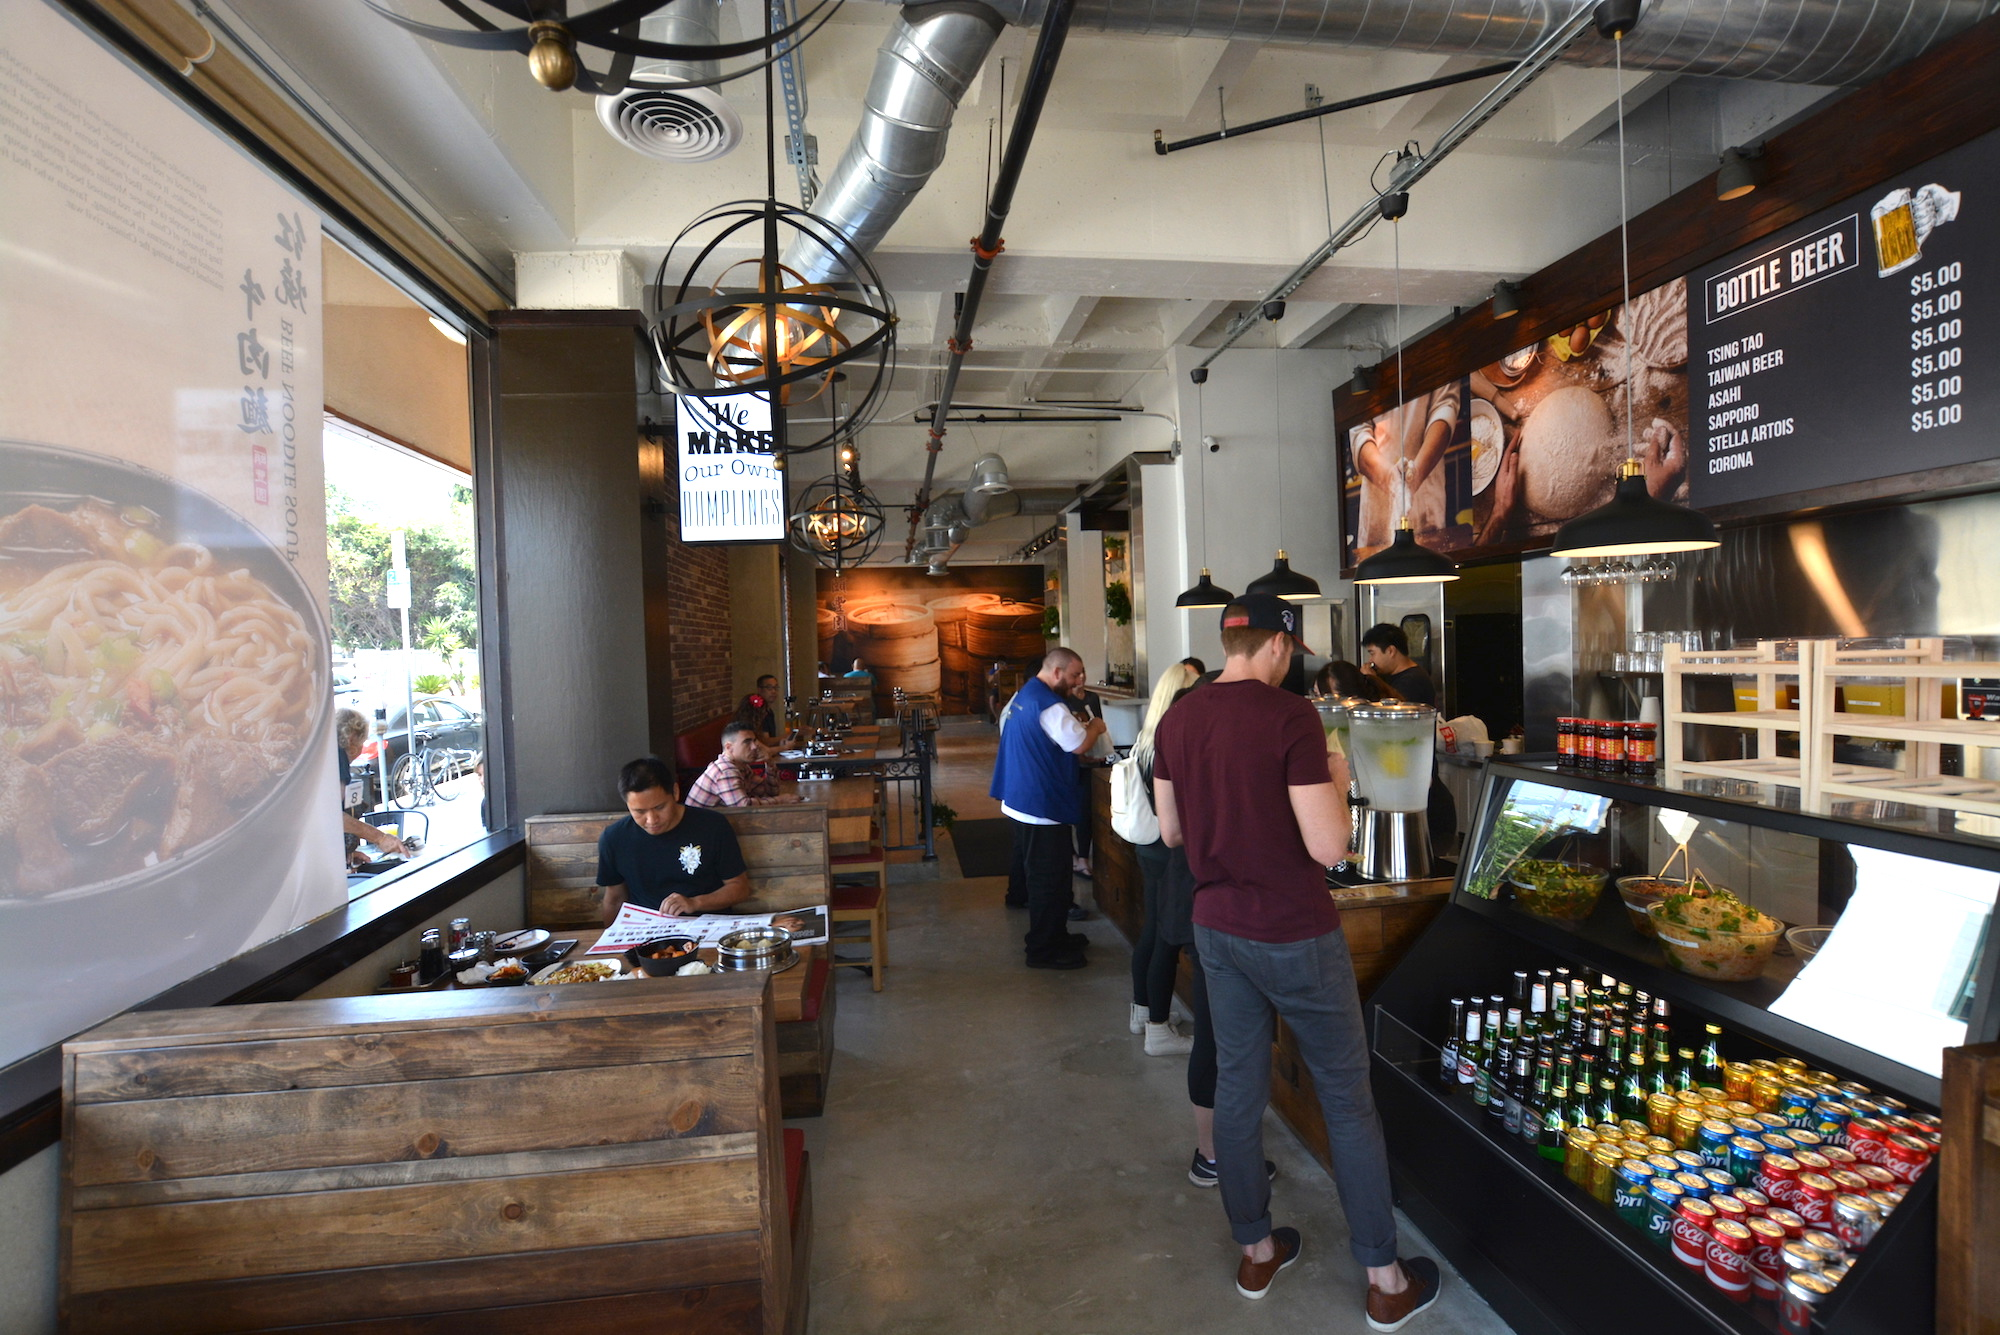 Northern Cafe Beverly Blvd Menu